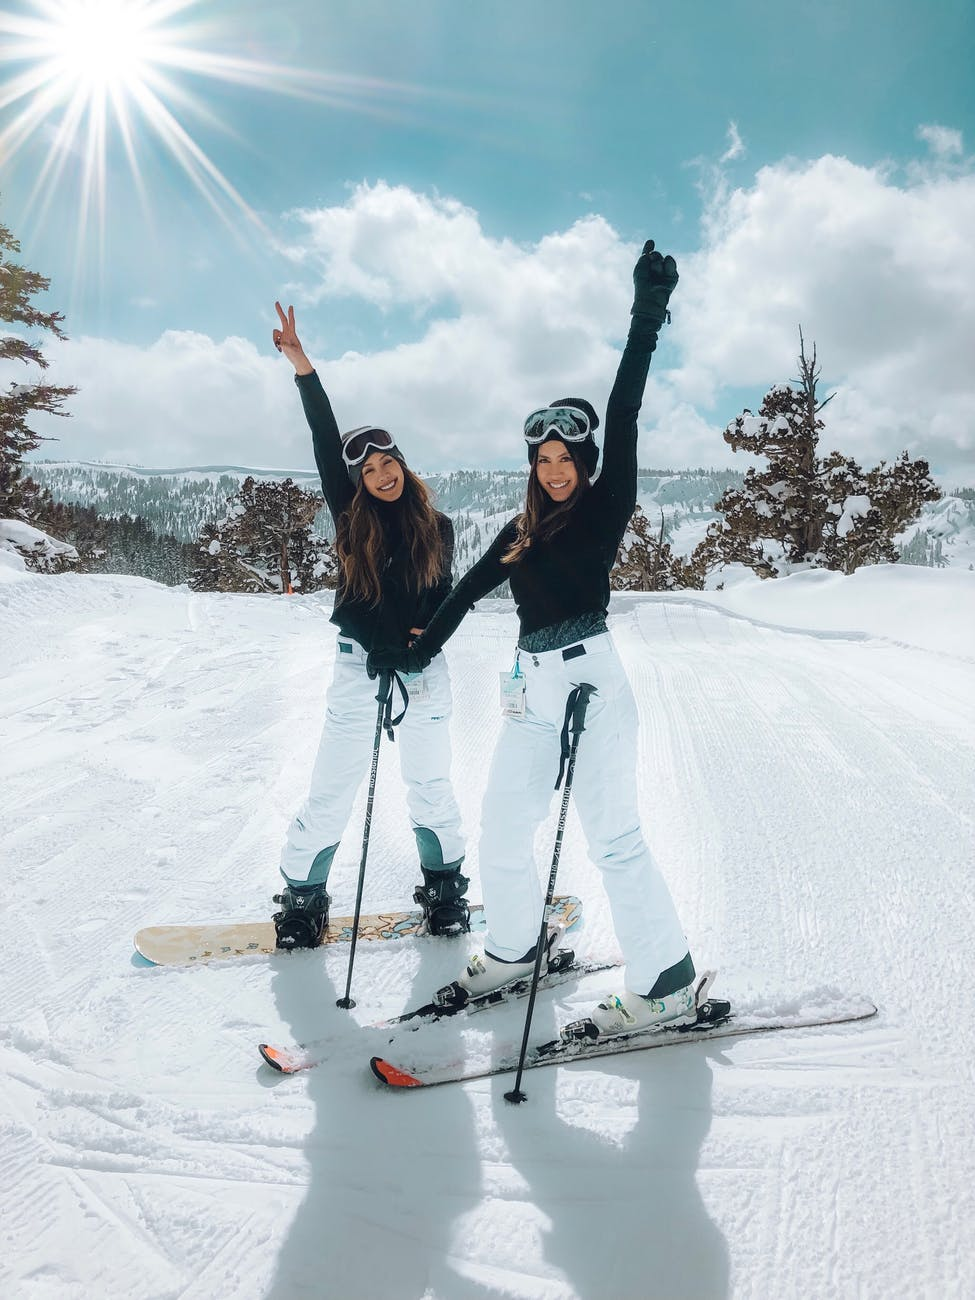 photo of two women skiing